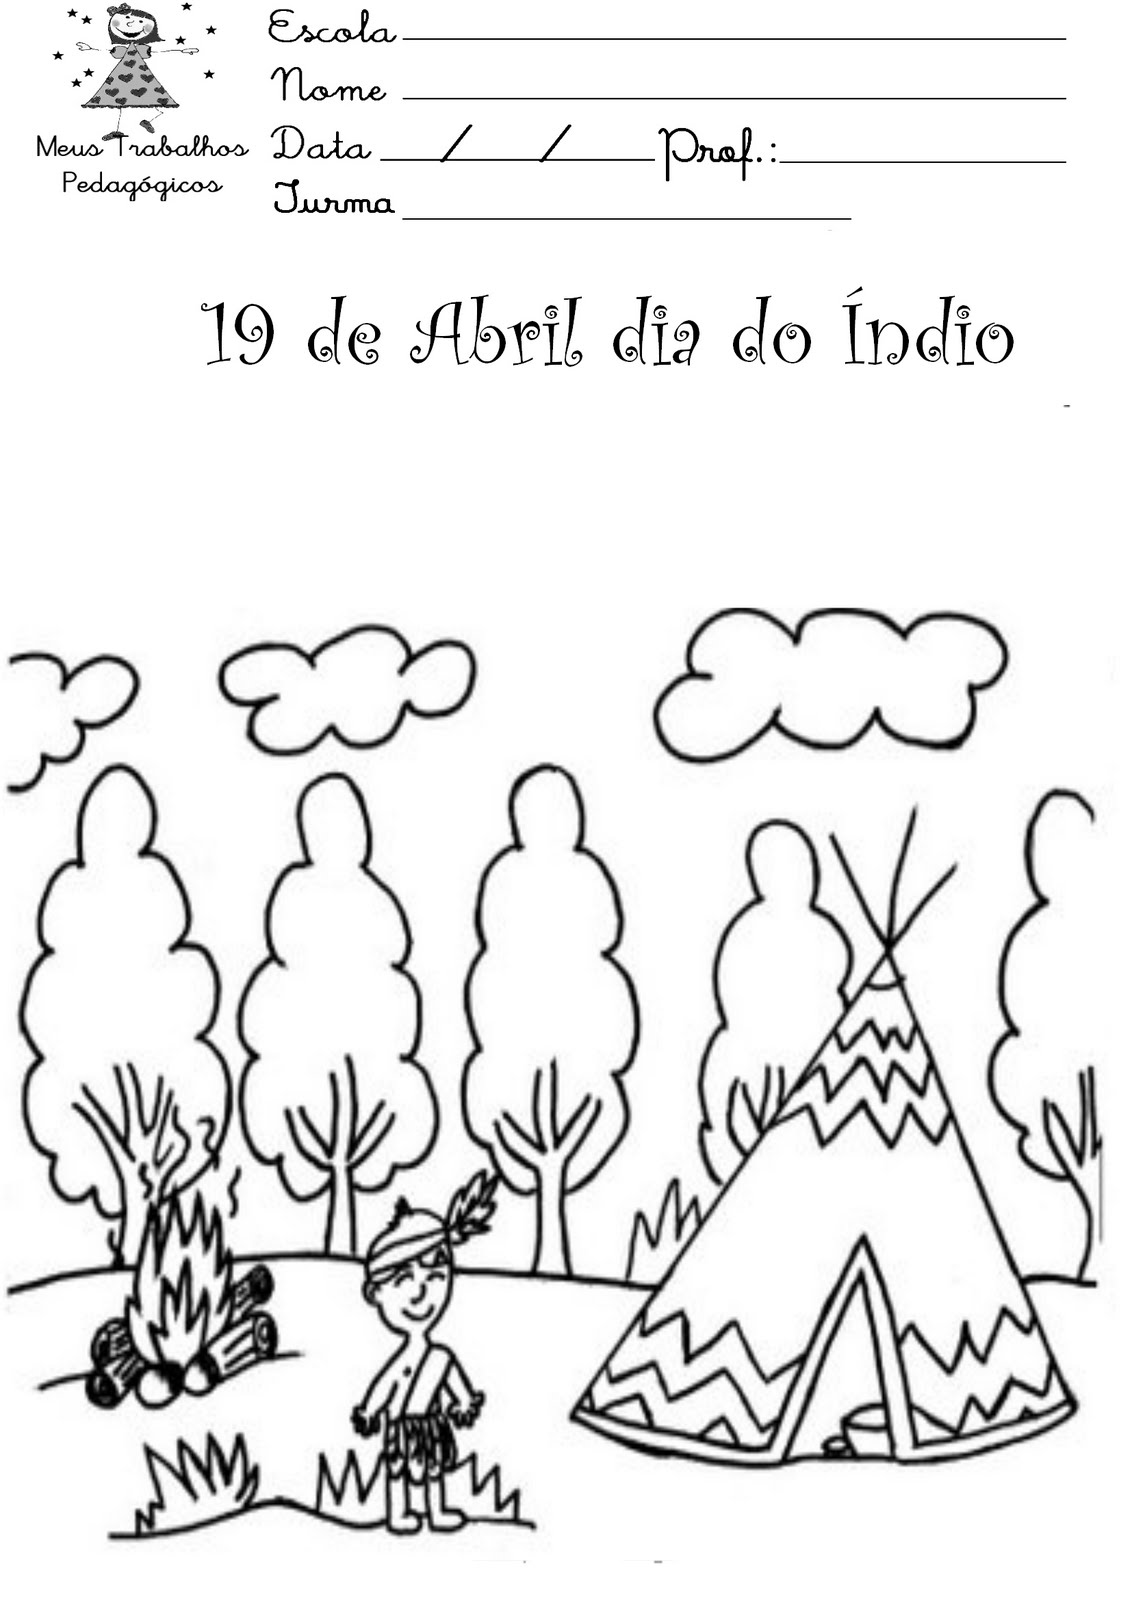 PZ C: indios para colorir